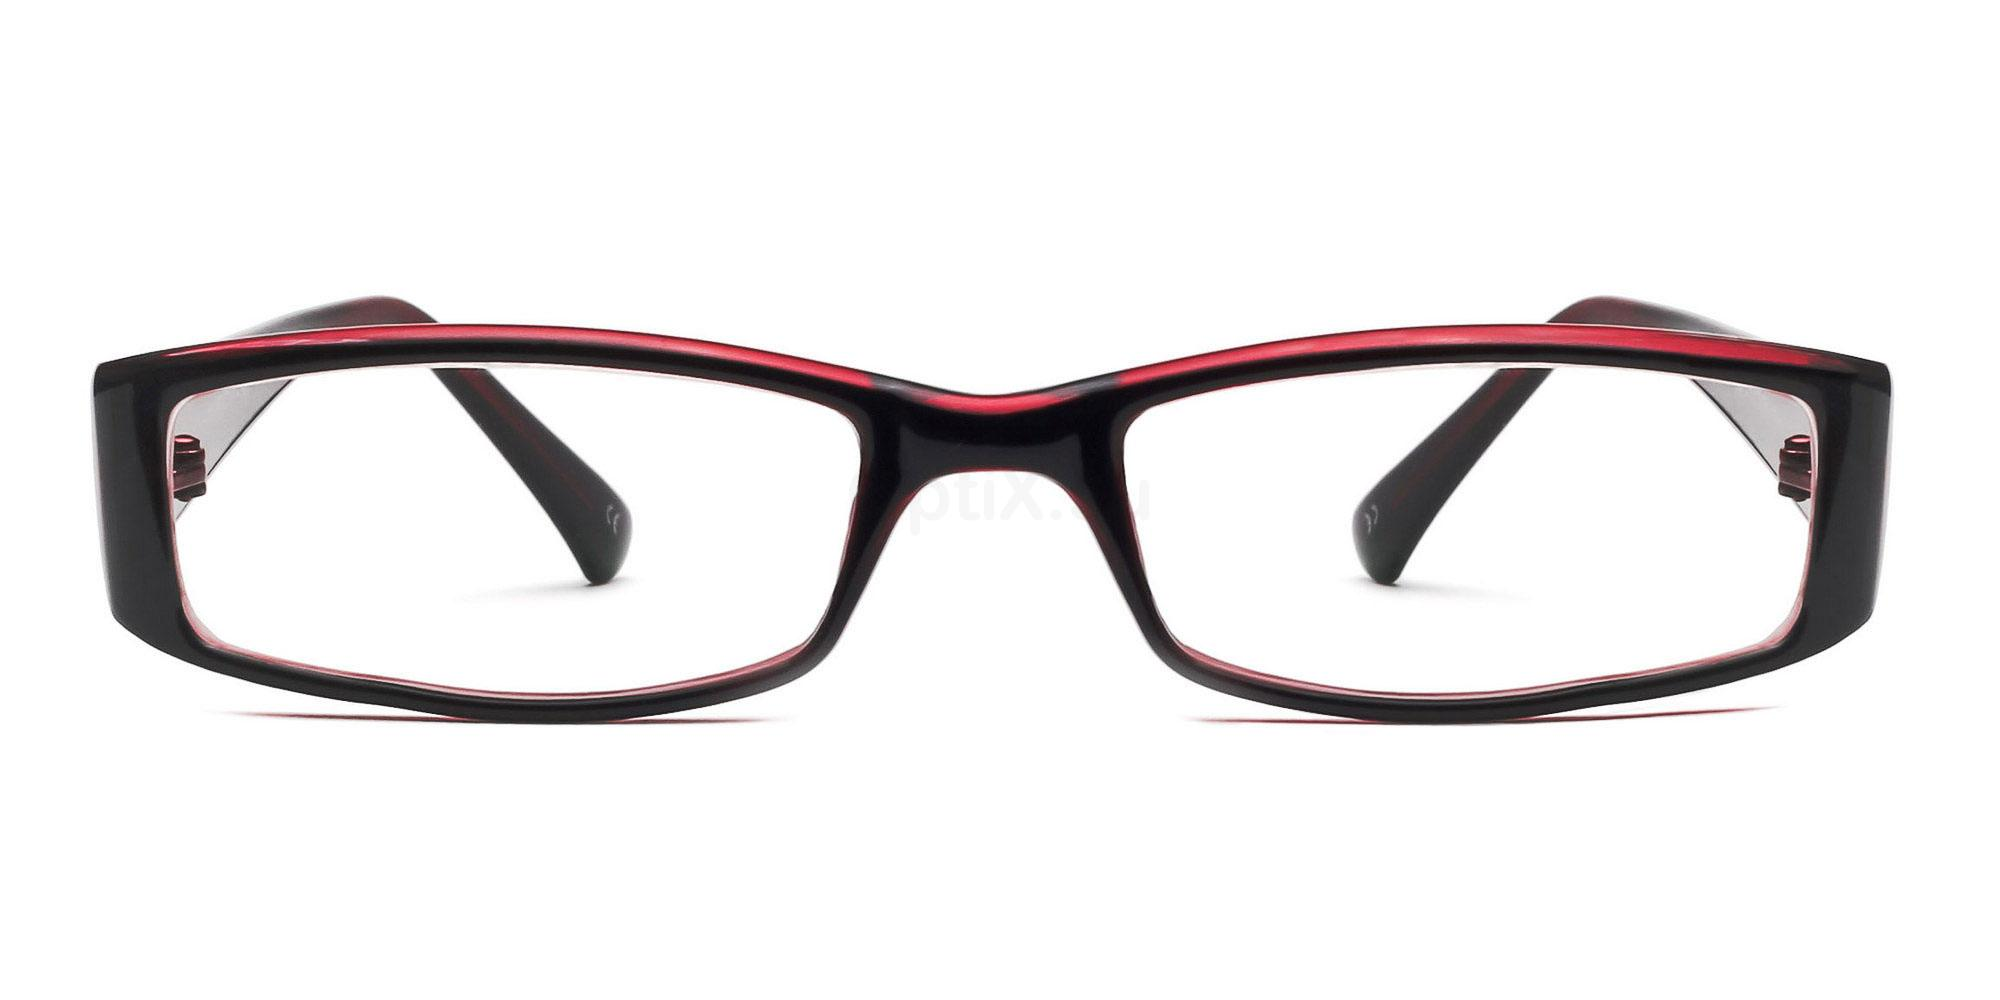 C38 P2251 - Black and Red , Savannah